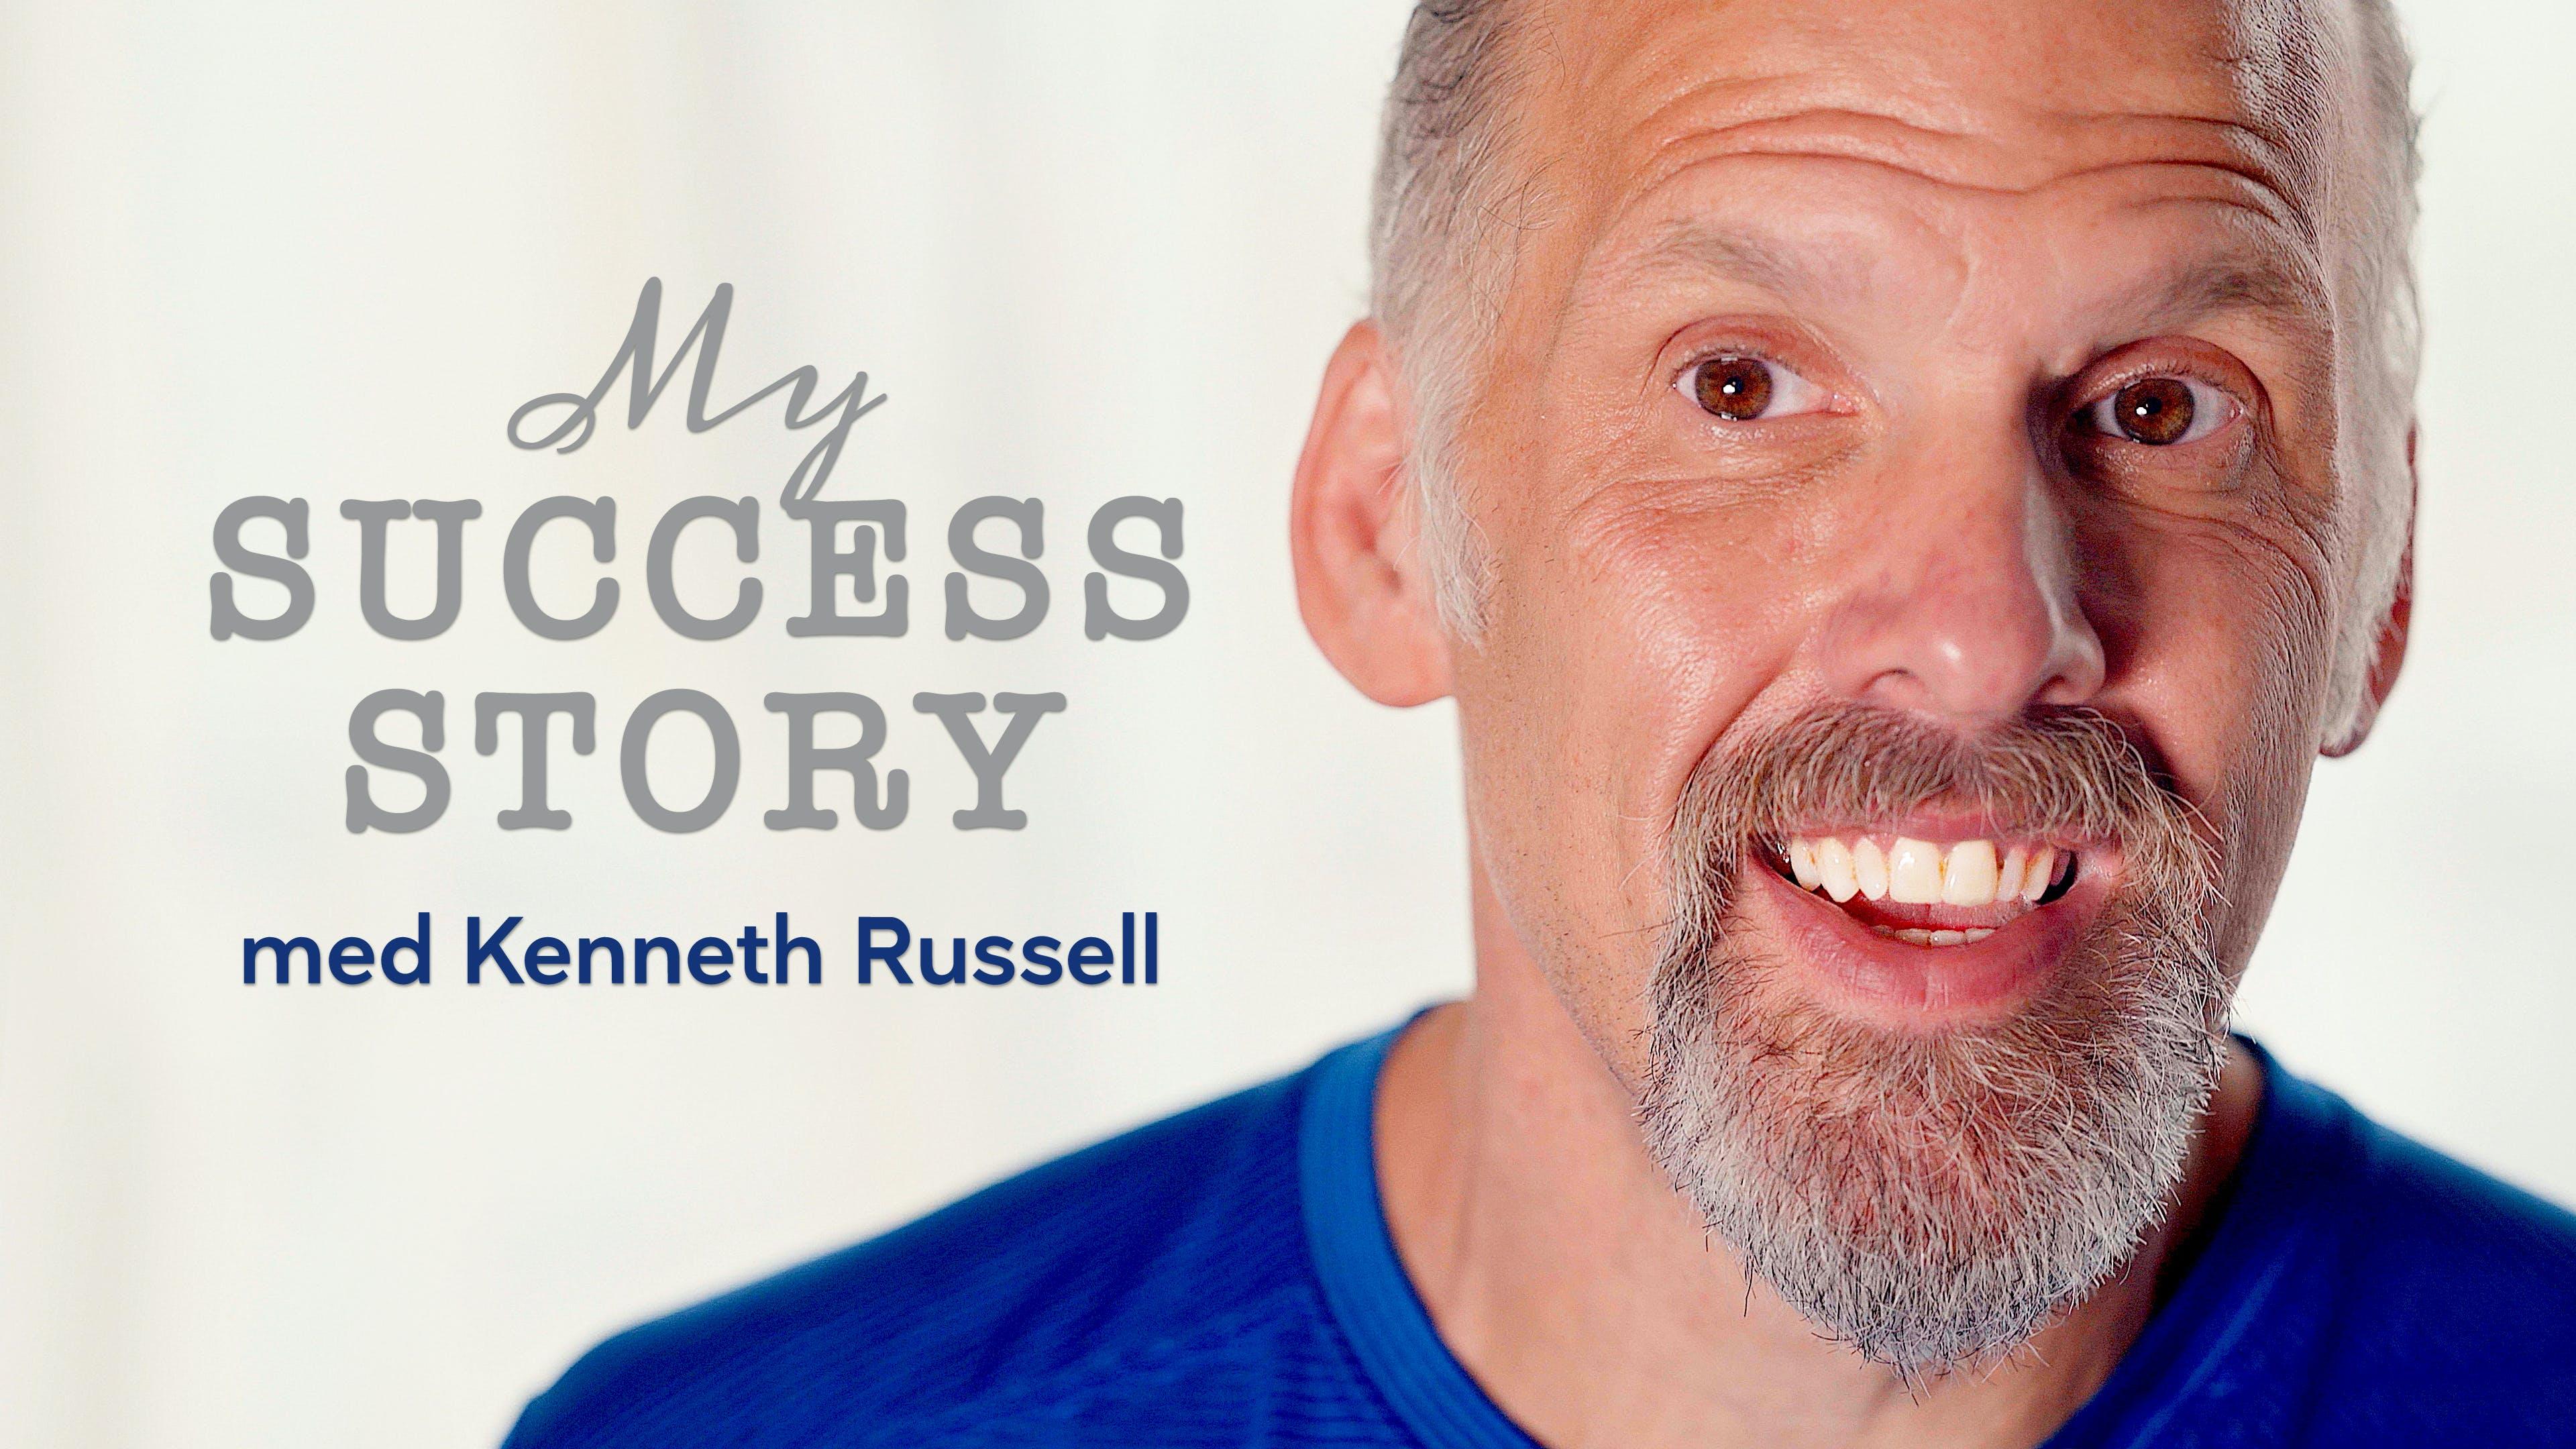 Kenneths framgångshistoria med LCHF